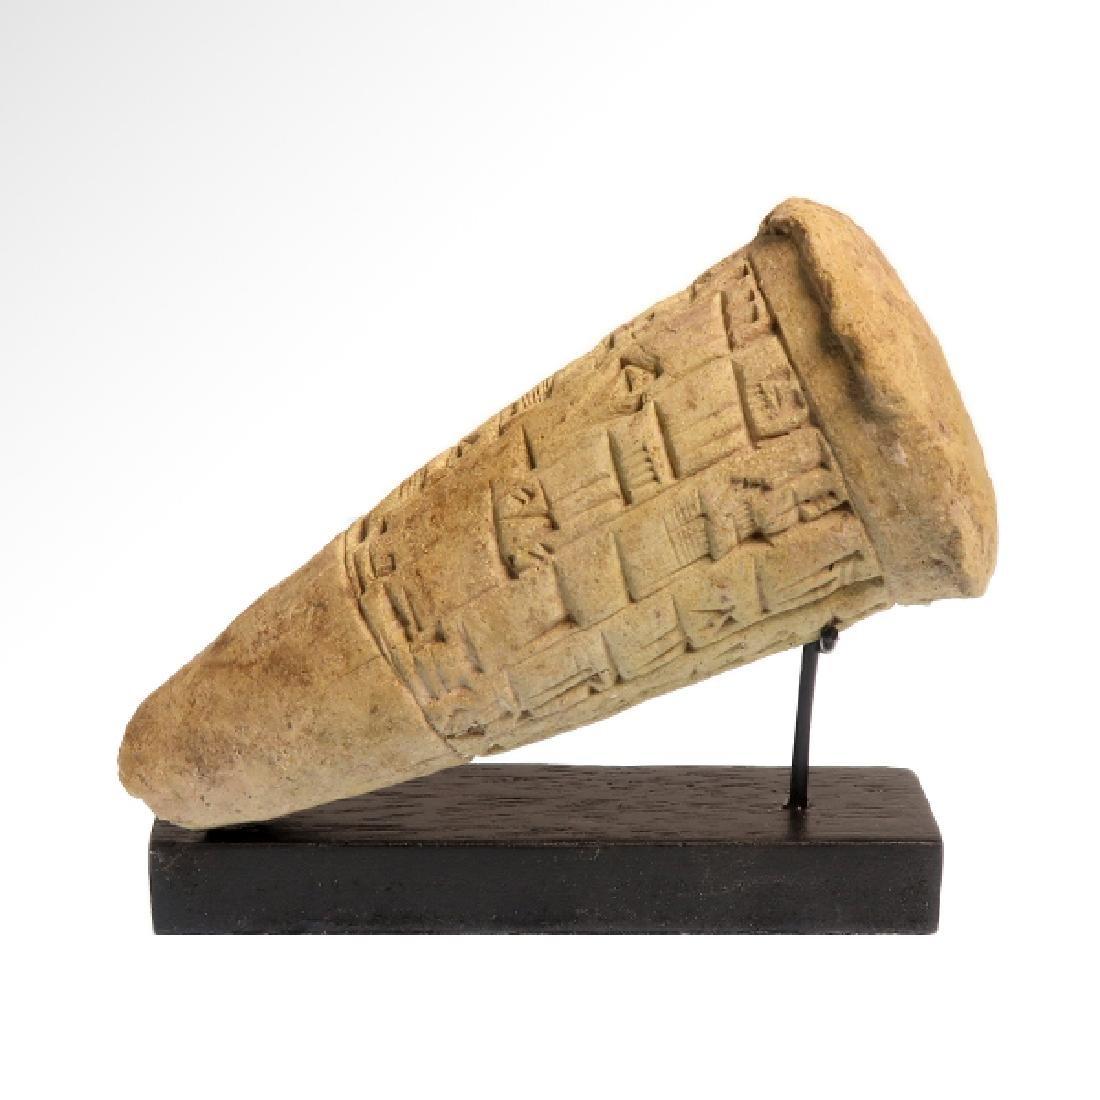 Sumerian Terracotta Dedication Foundation Cone